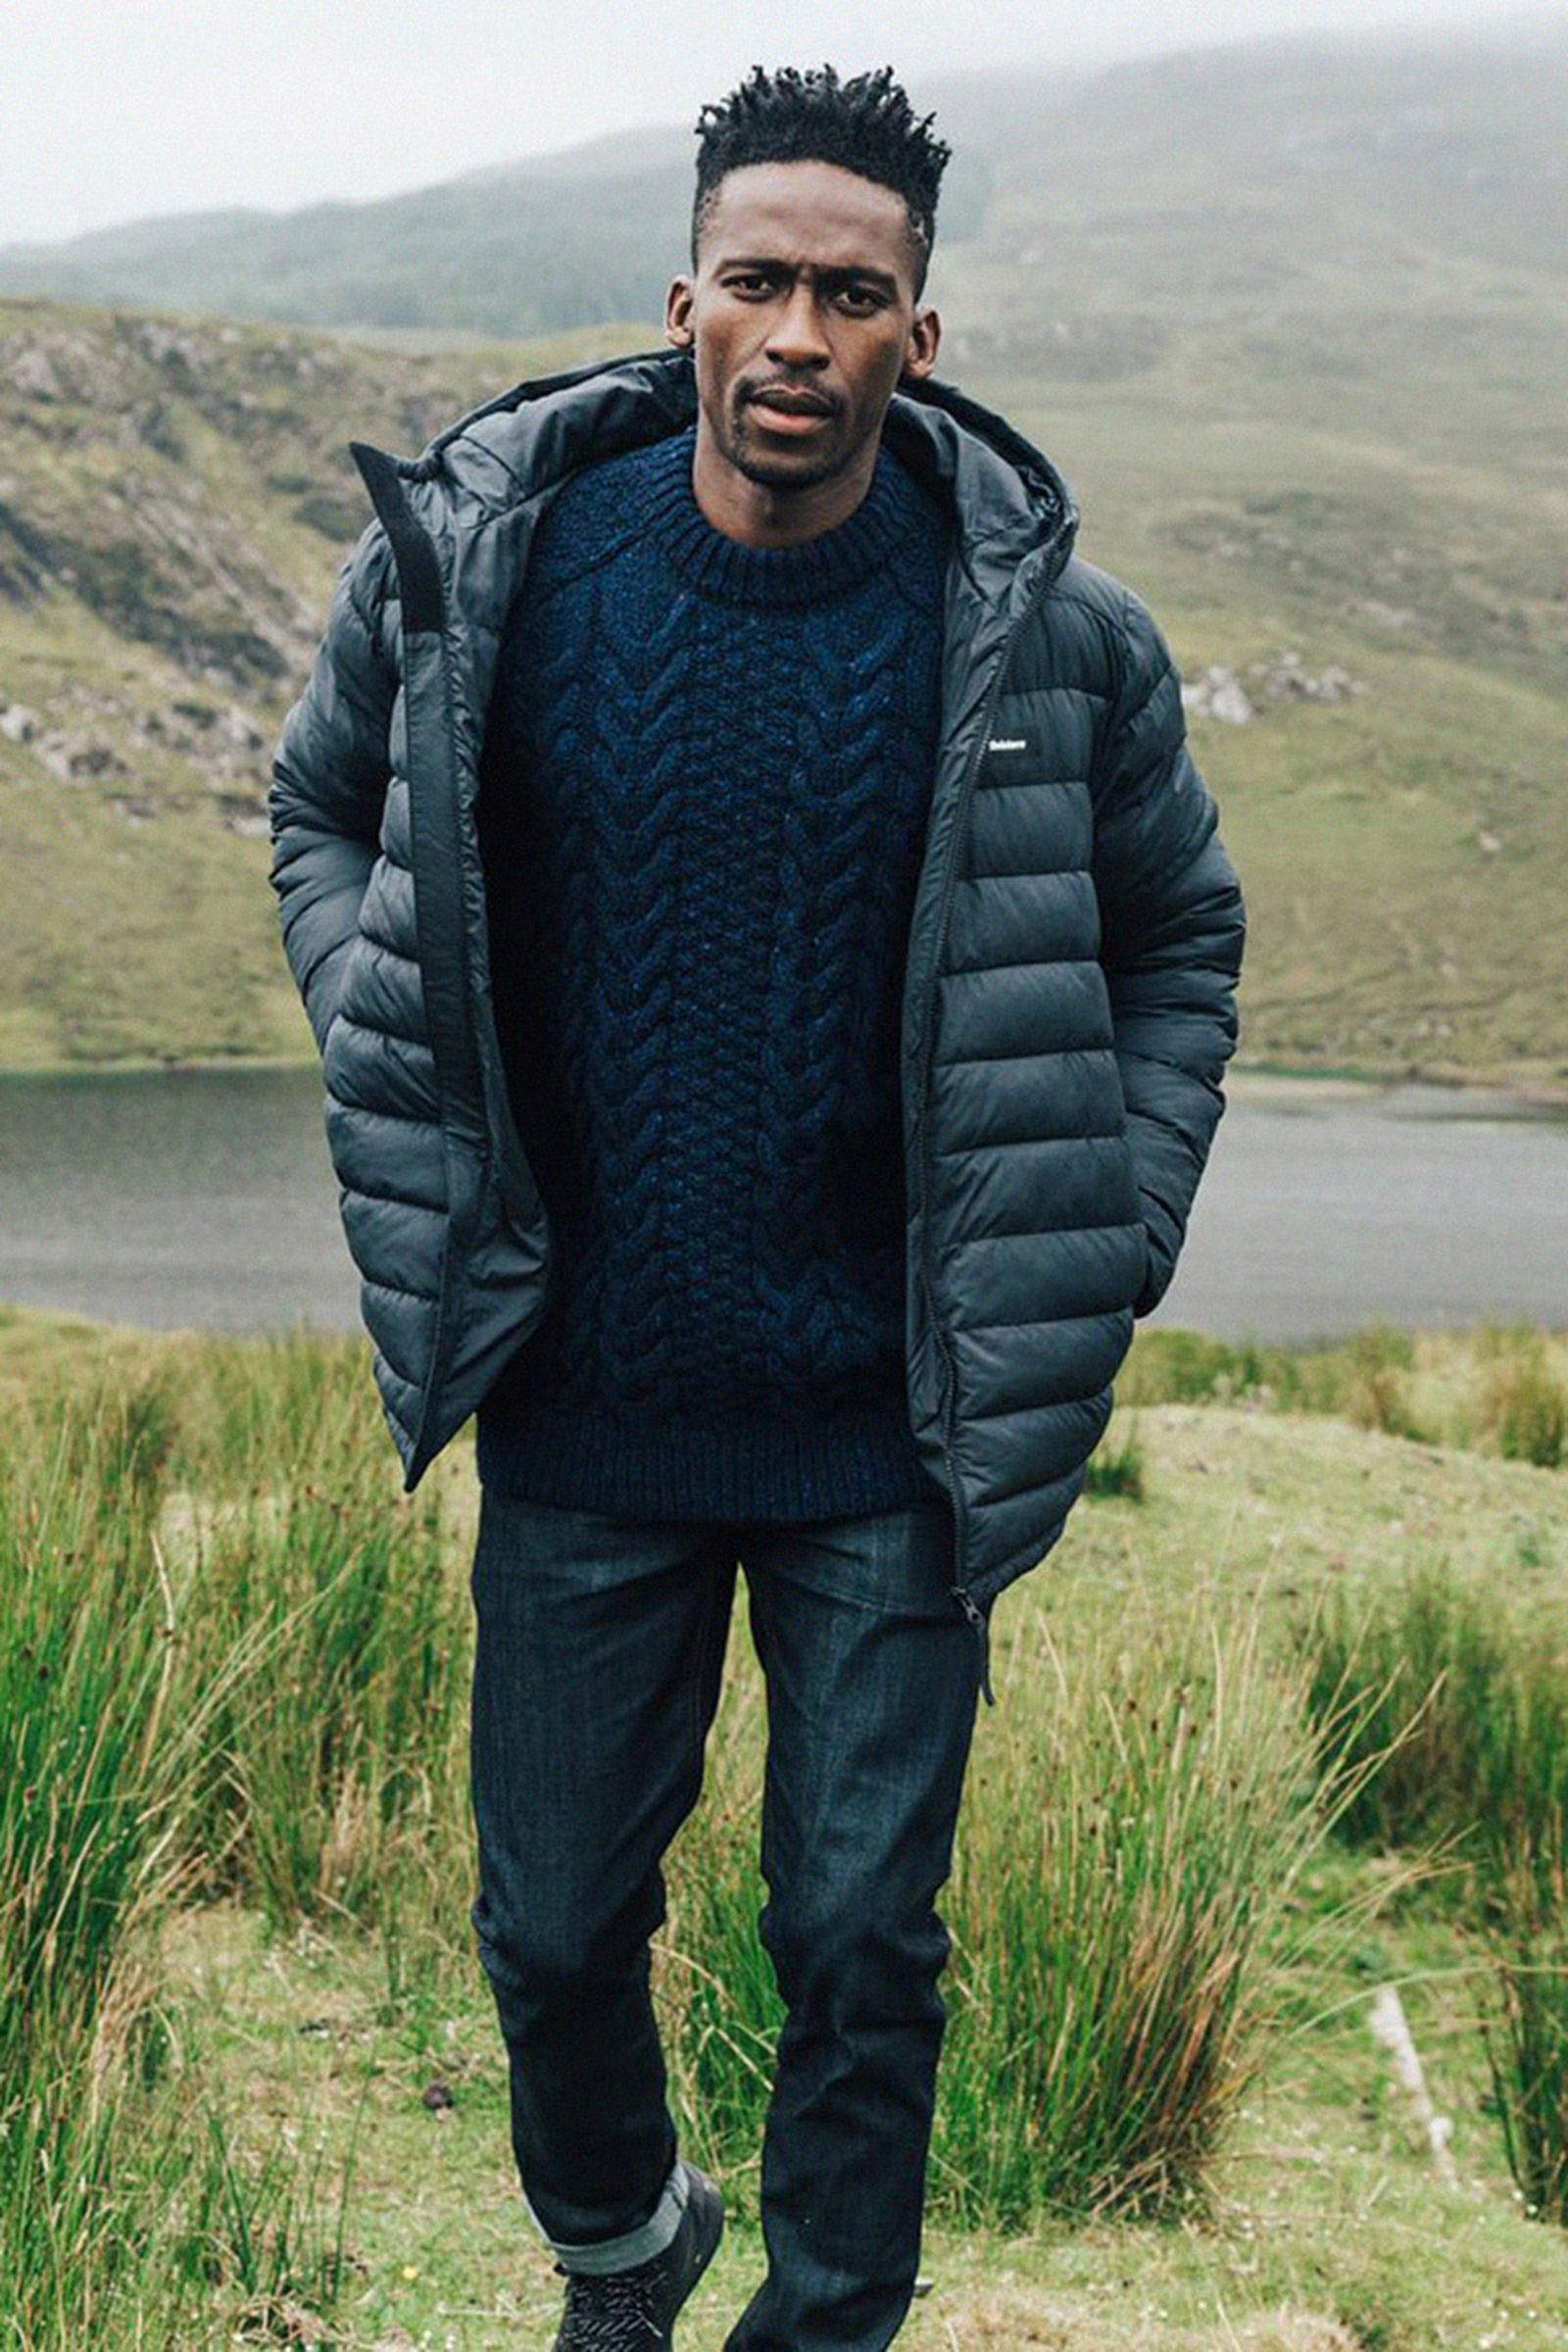 best sustainable fashion brands finistierre Armedangels Jungmaven Knowledge Cotton Apparel